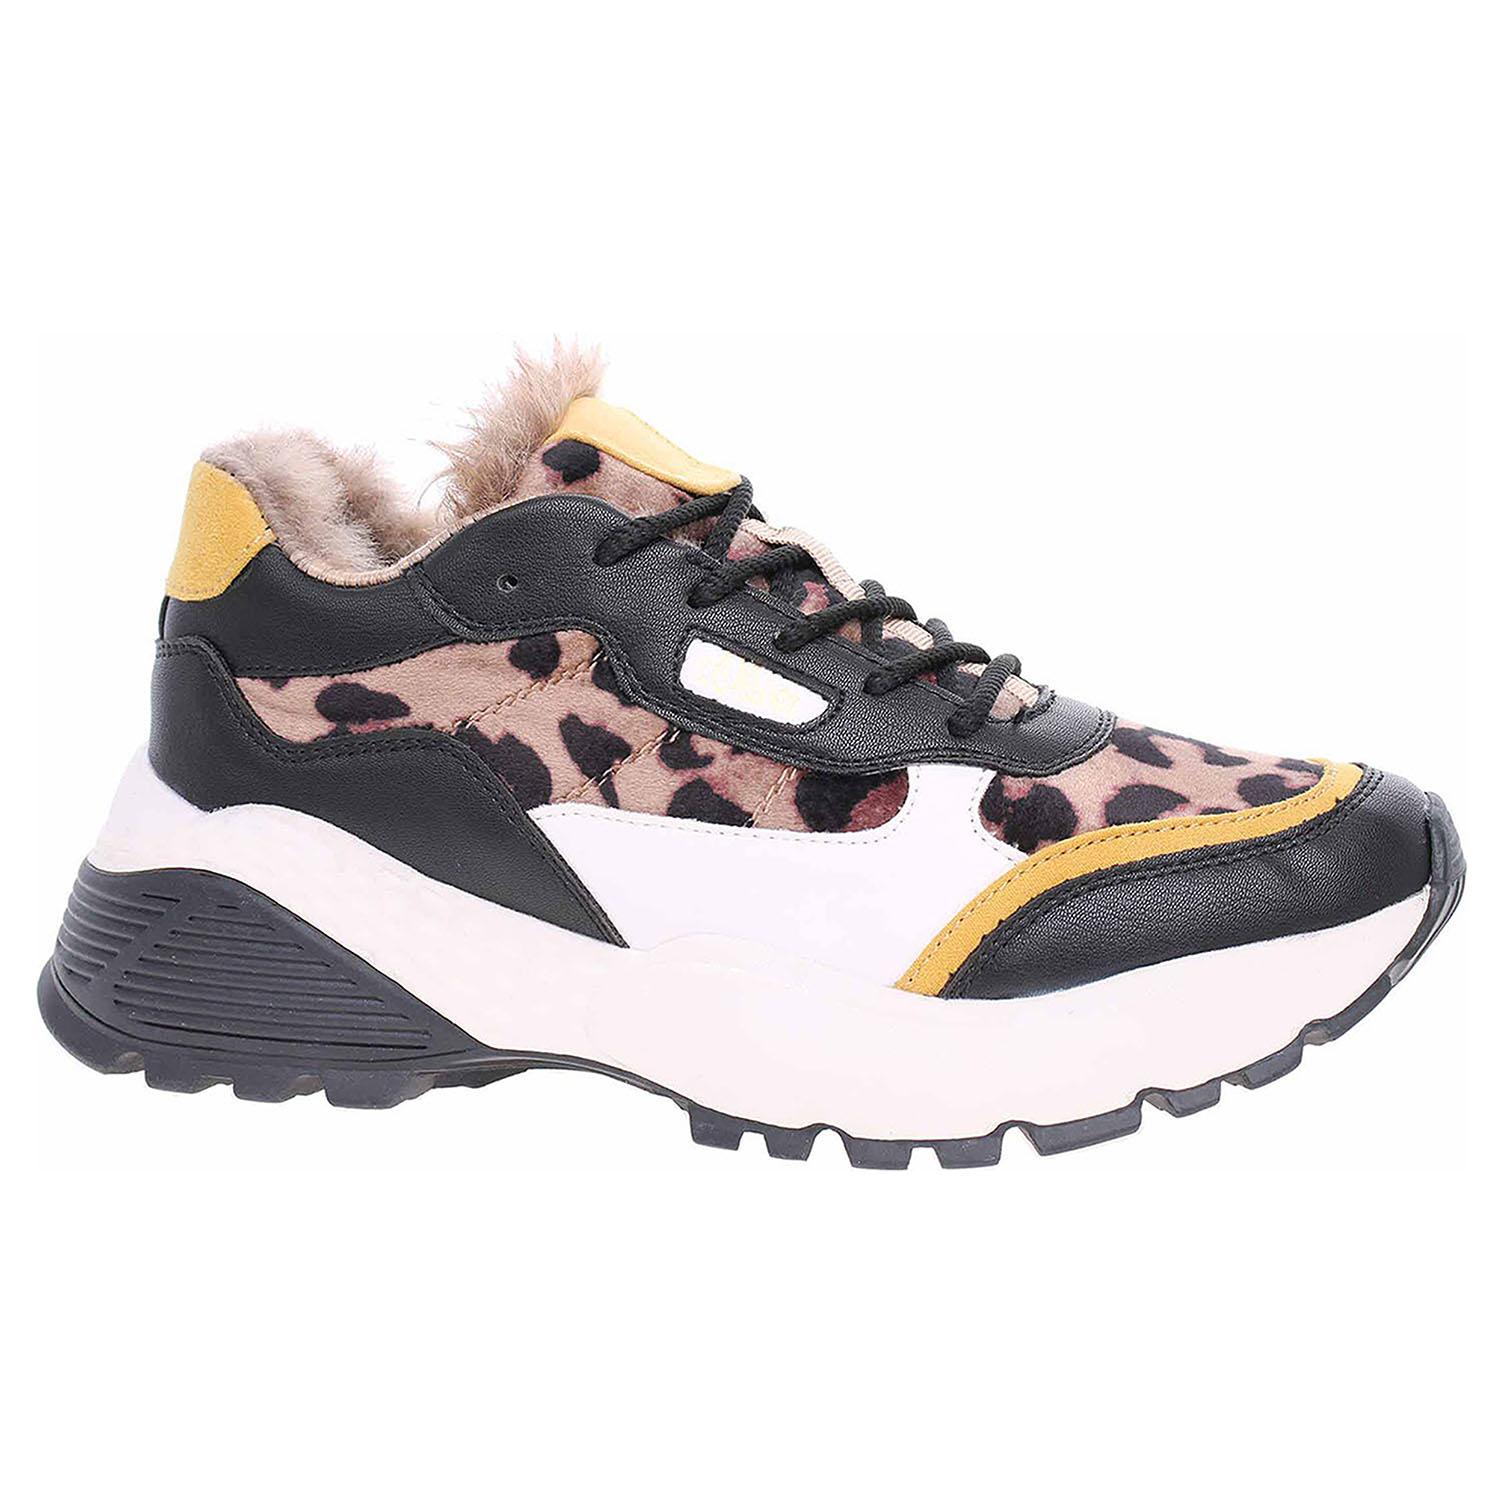 Dámská obuv s.Oliver 5-23628-33 black-leo comb 5-5-23628-33 089 39